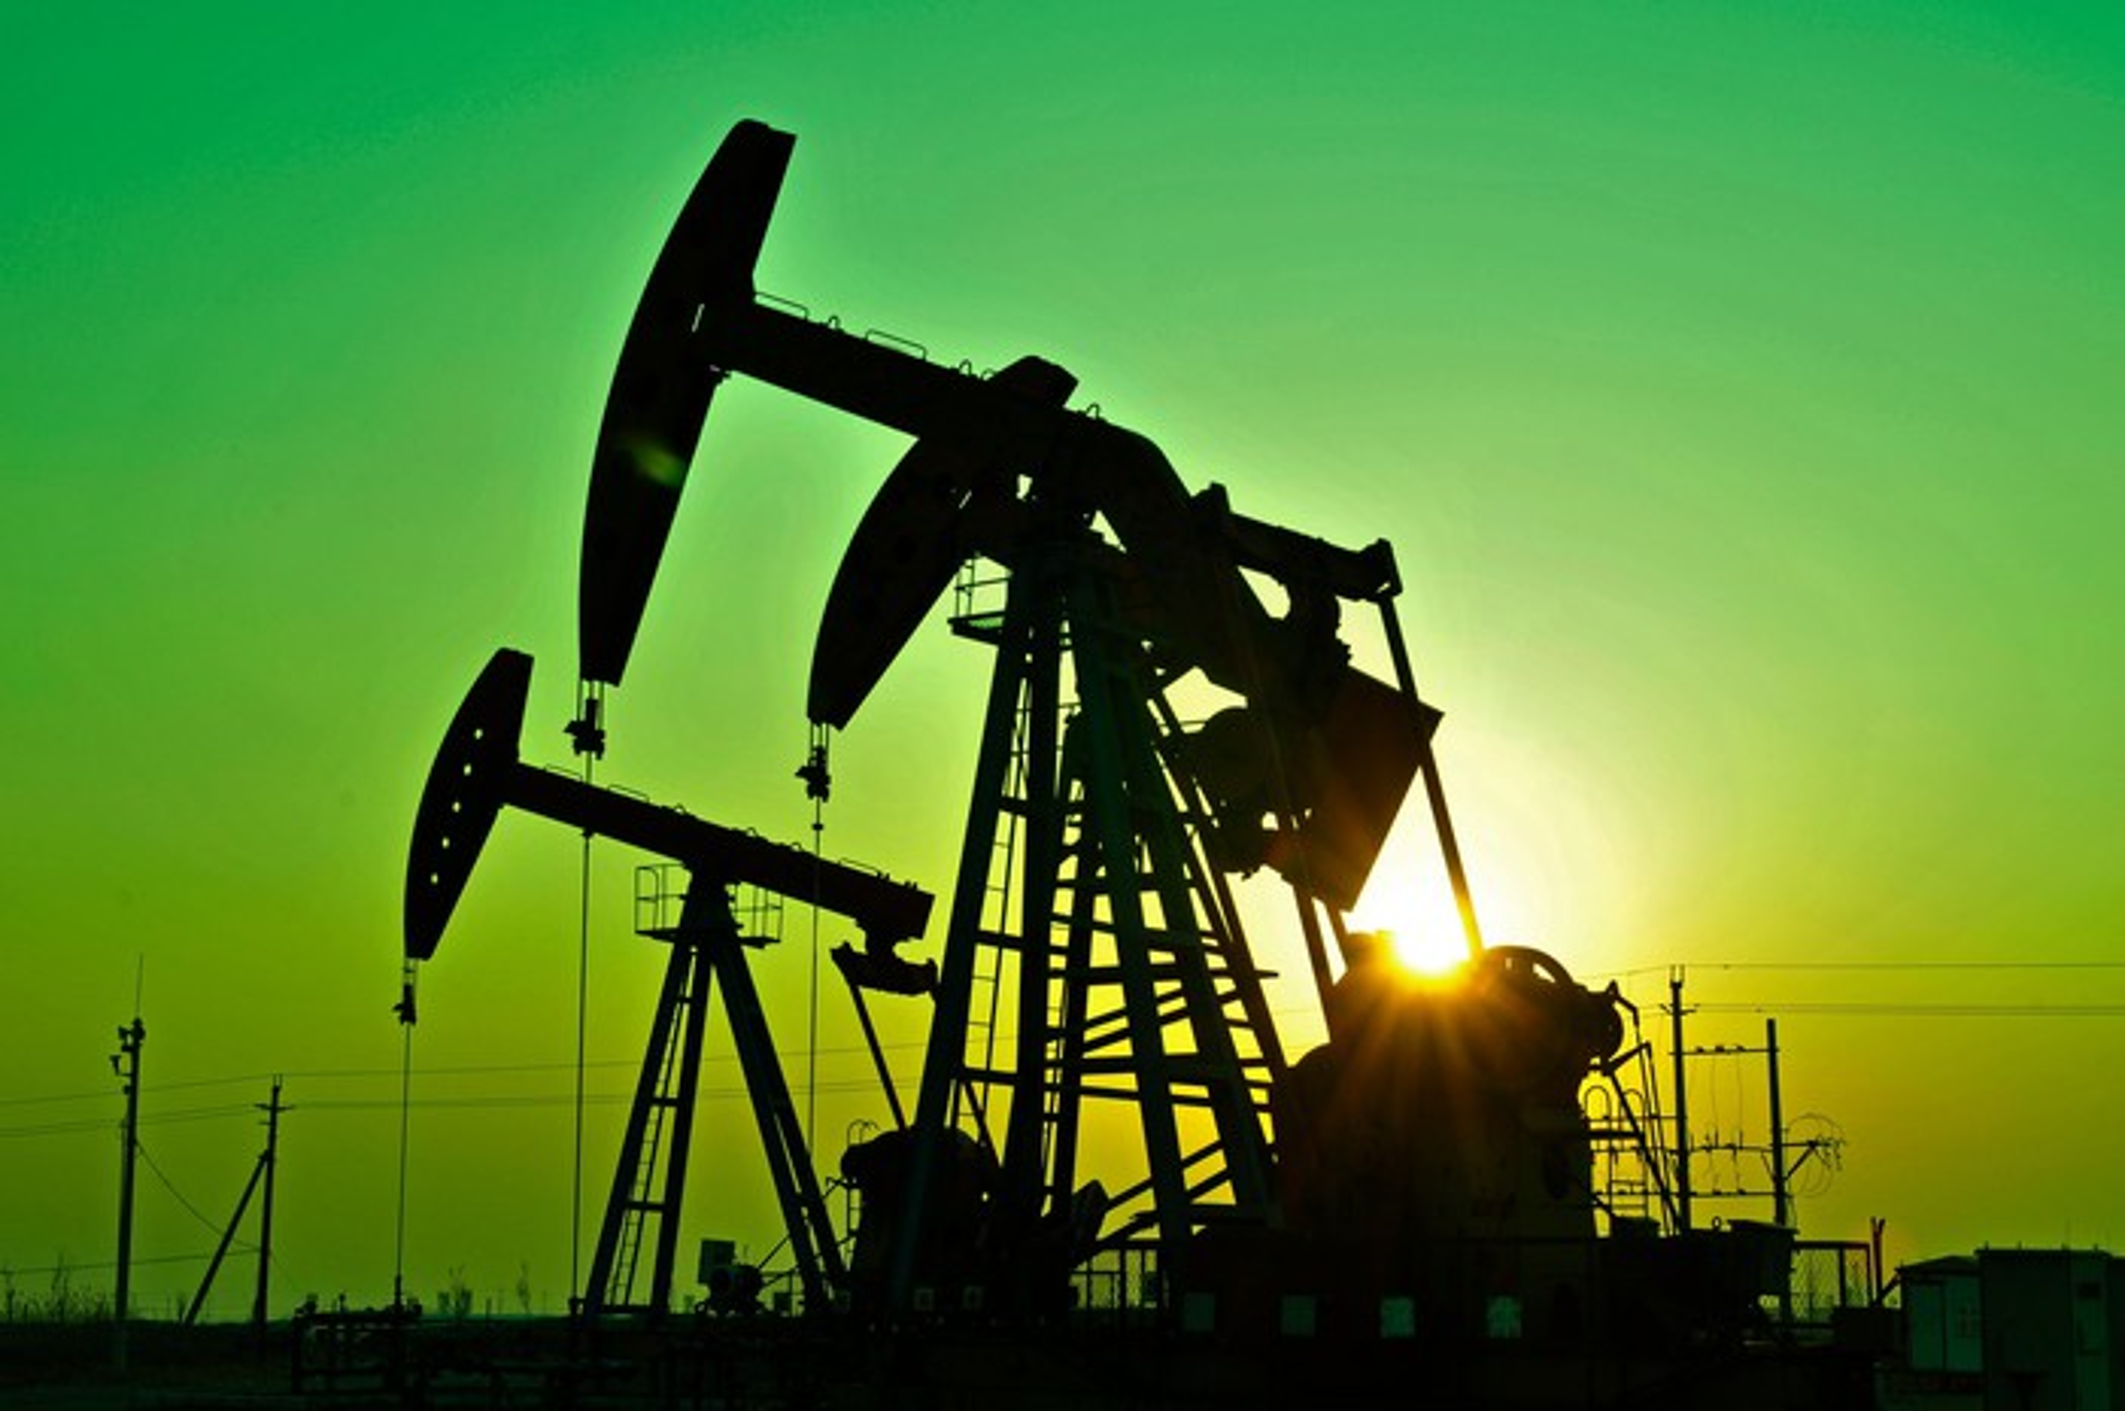 Oil pumpjacks in front of a green sky.